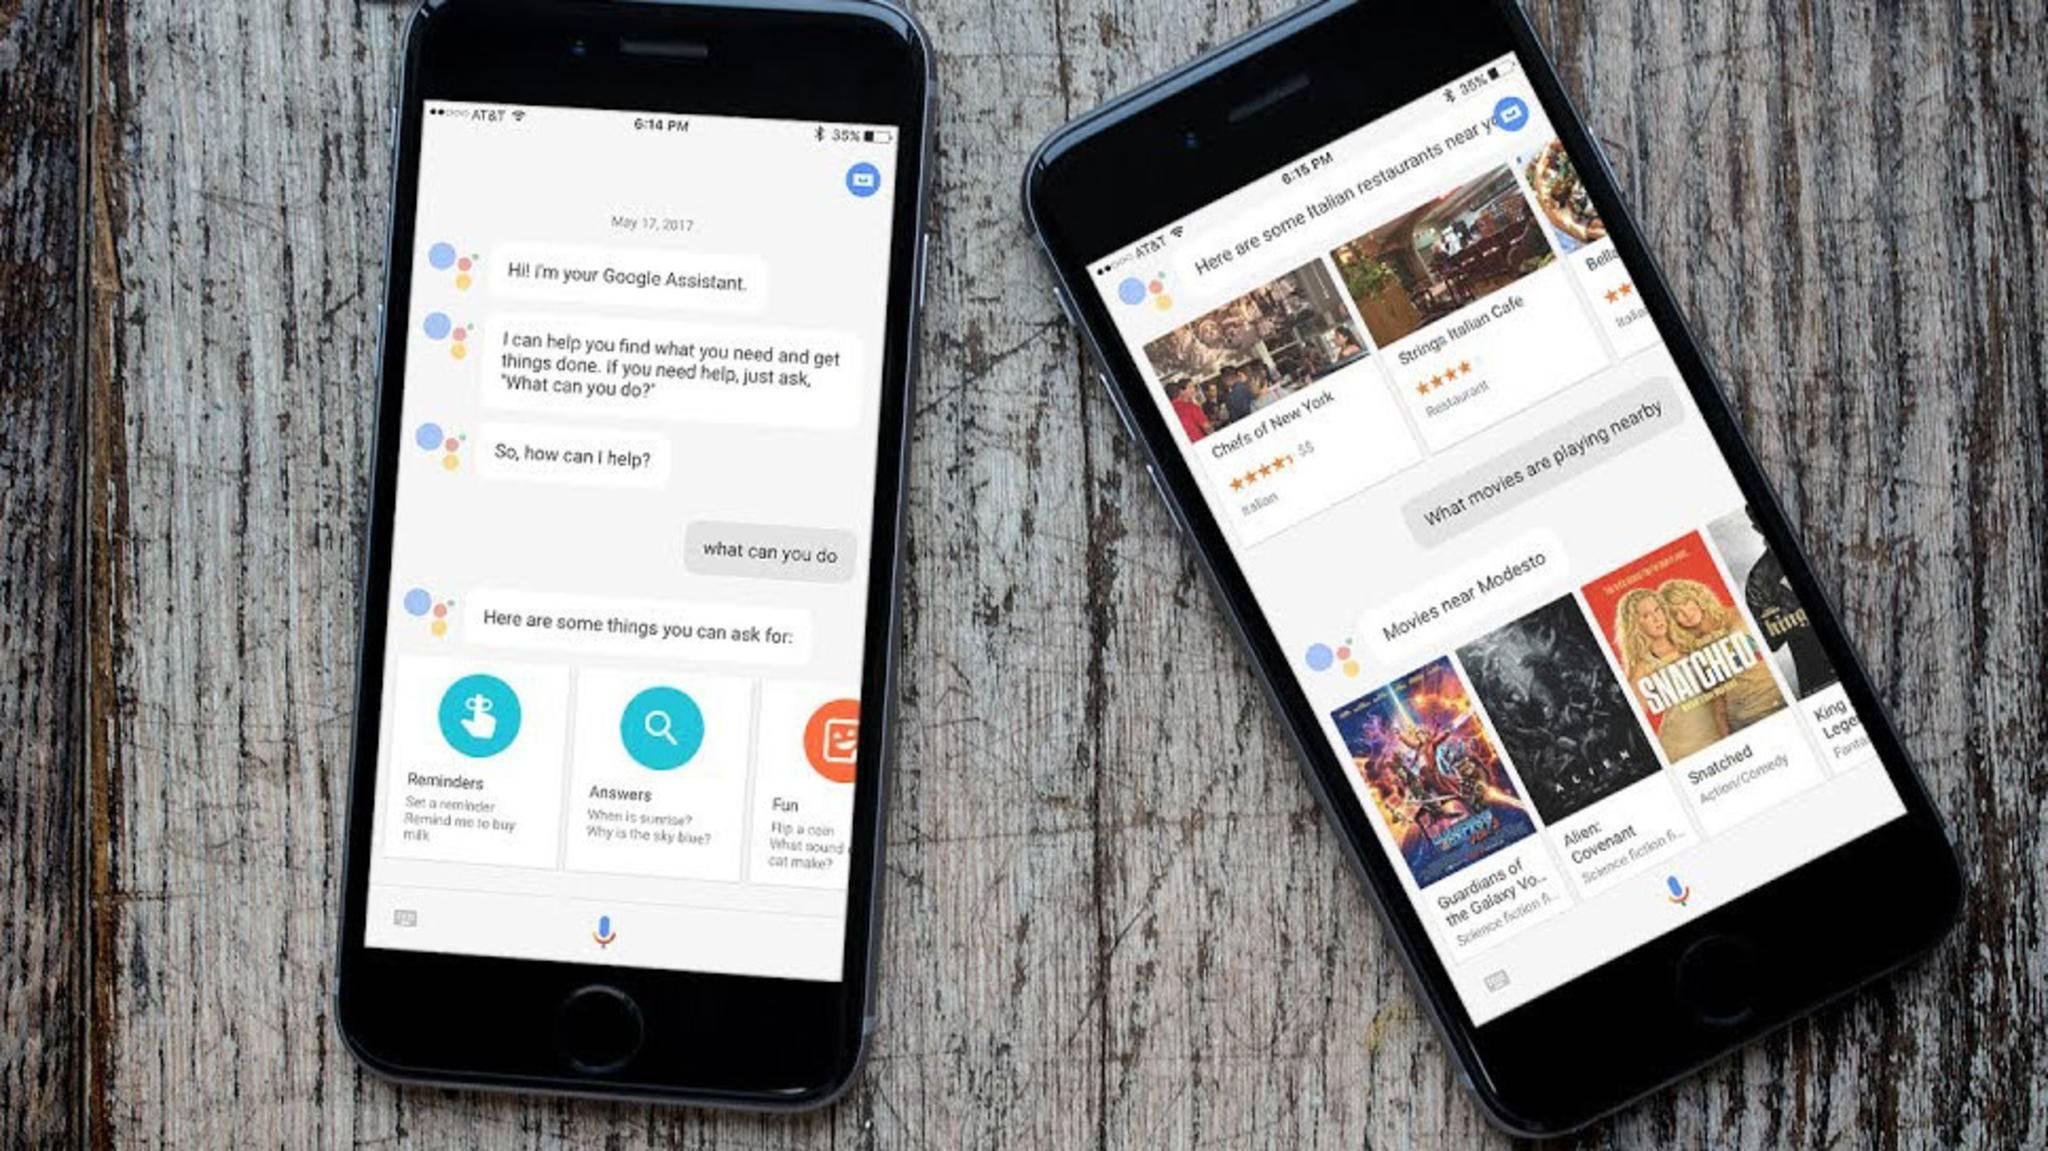 google assistant f rs iphone app jetzt in deutschland. Black Bedroom Furniture Sets. Home Design Ideas